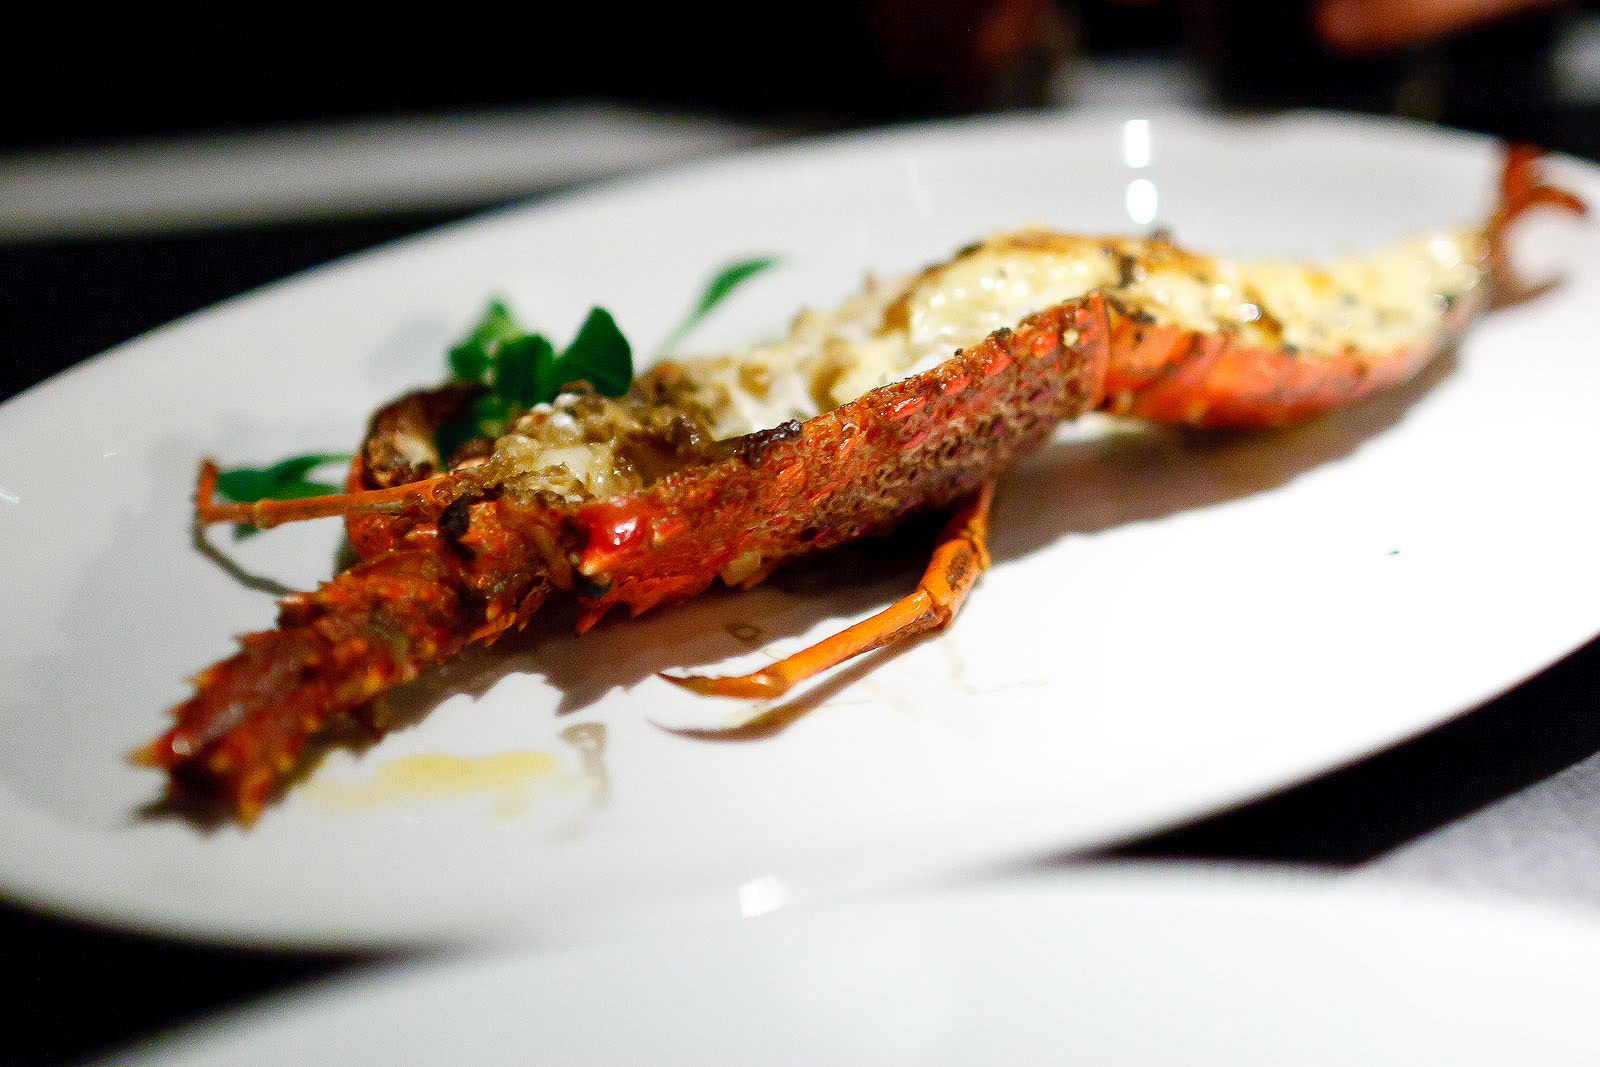 New York Grill, Tokyo - Australian Southern Rock Lobster, Black Truffle, Champagne Sauce